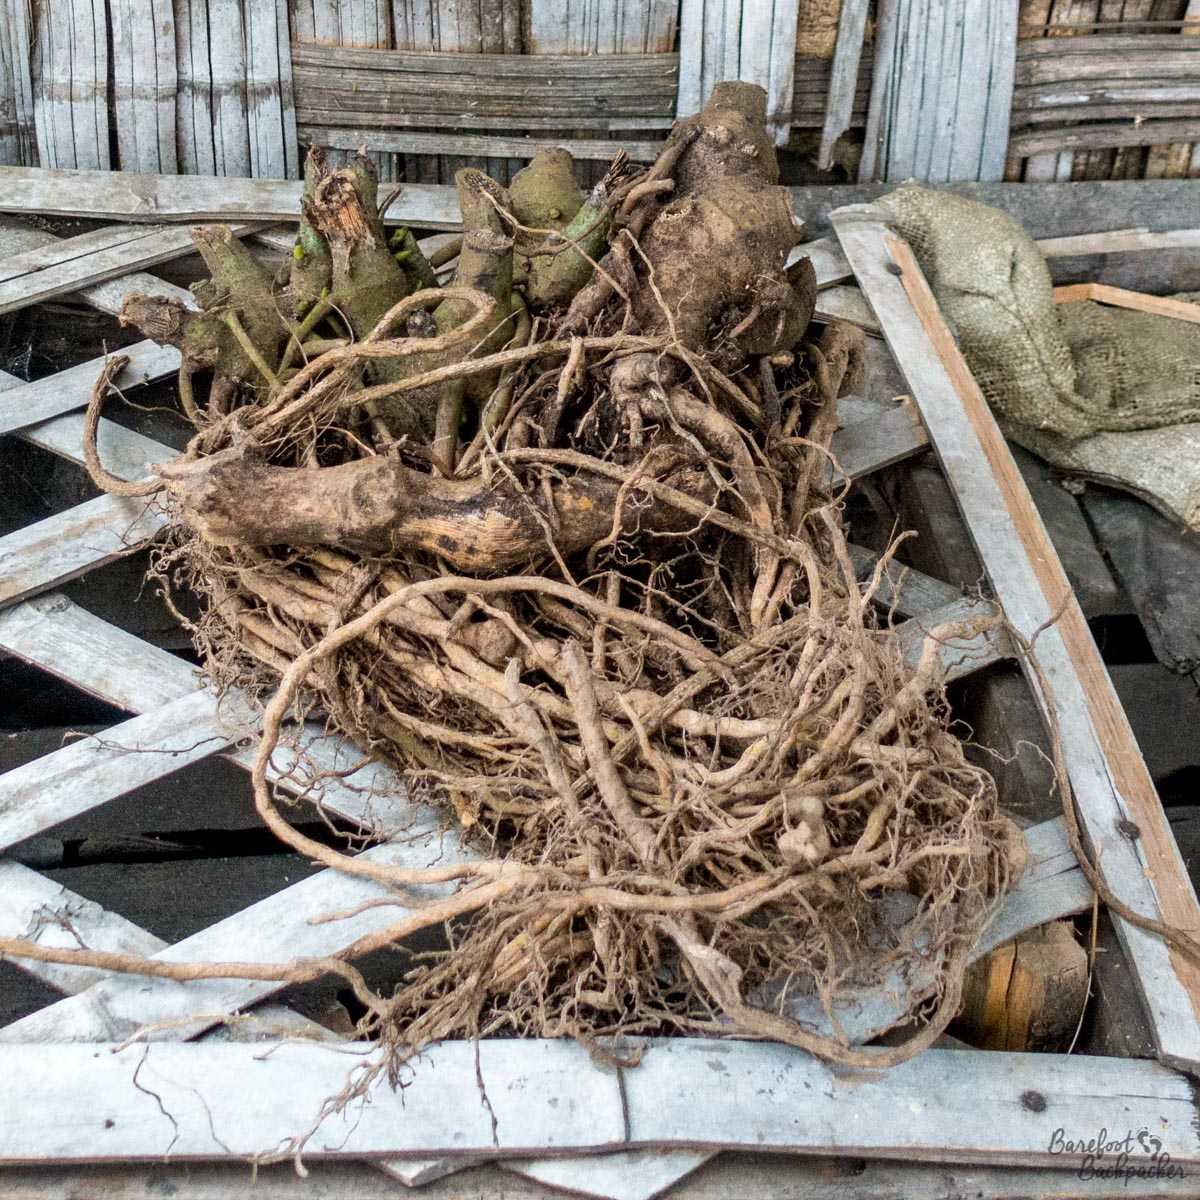 Roots of the Kava plant, Ambrym, Vanuatu.